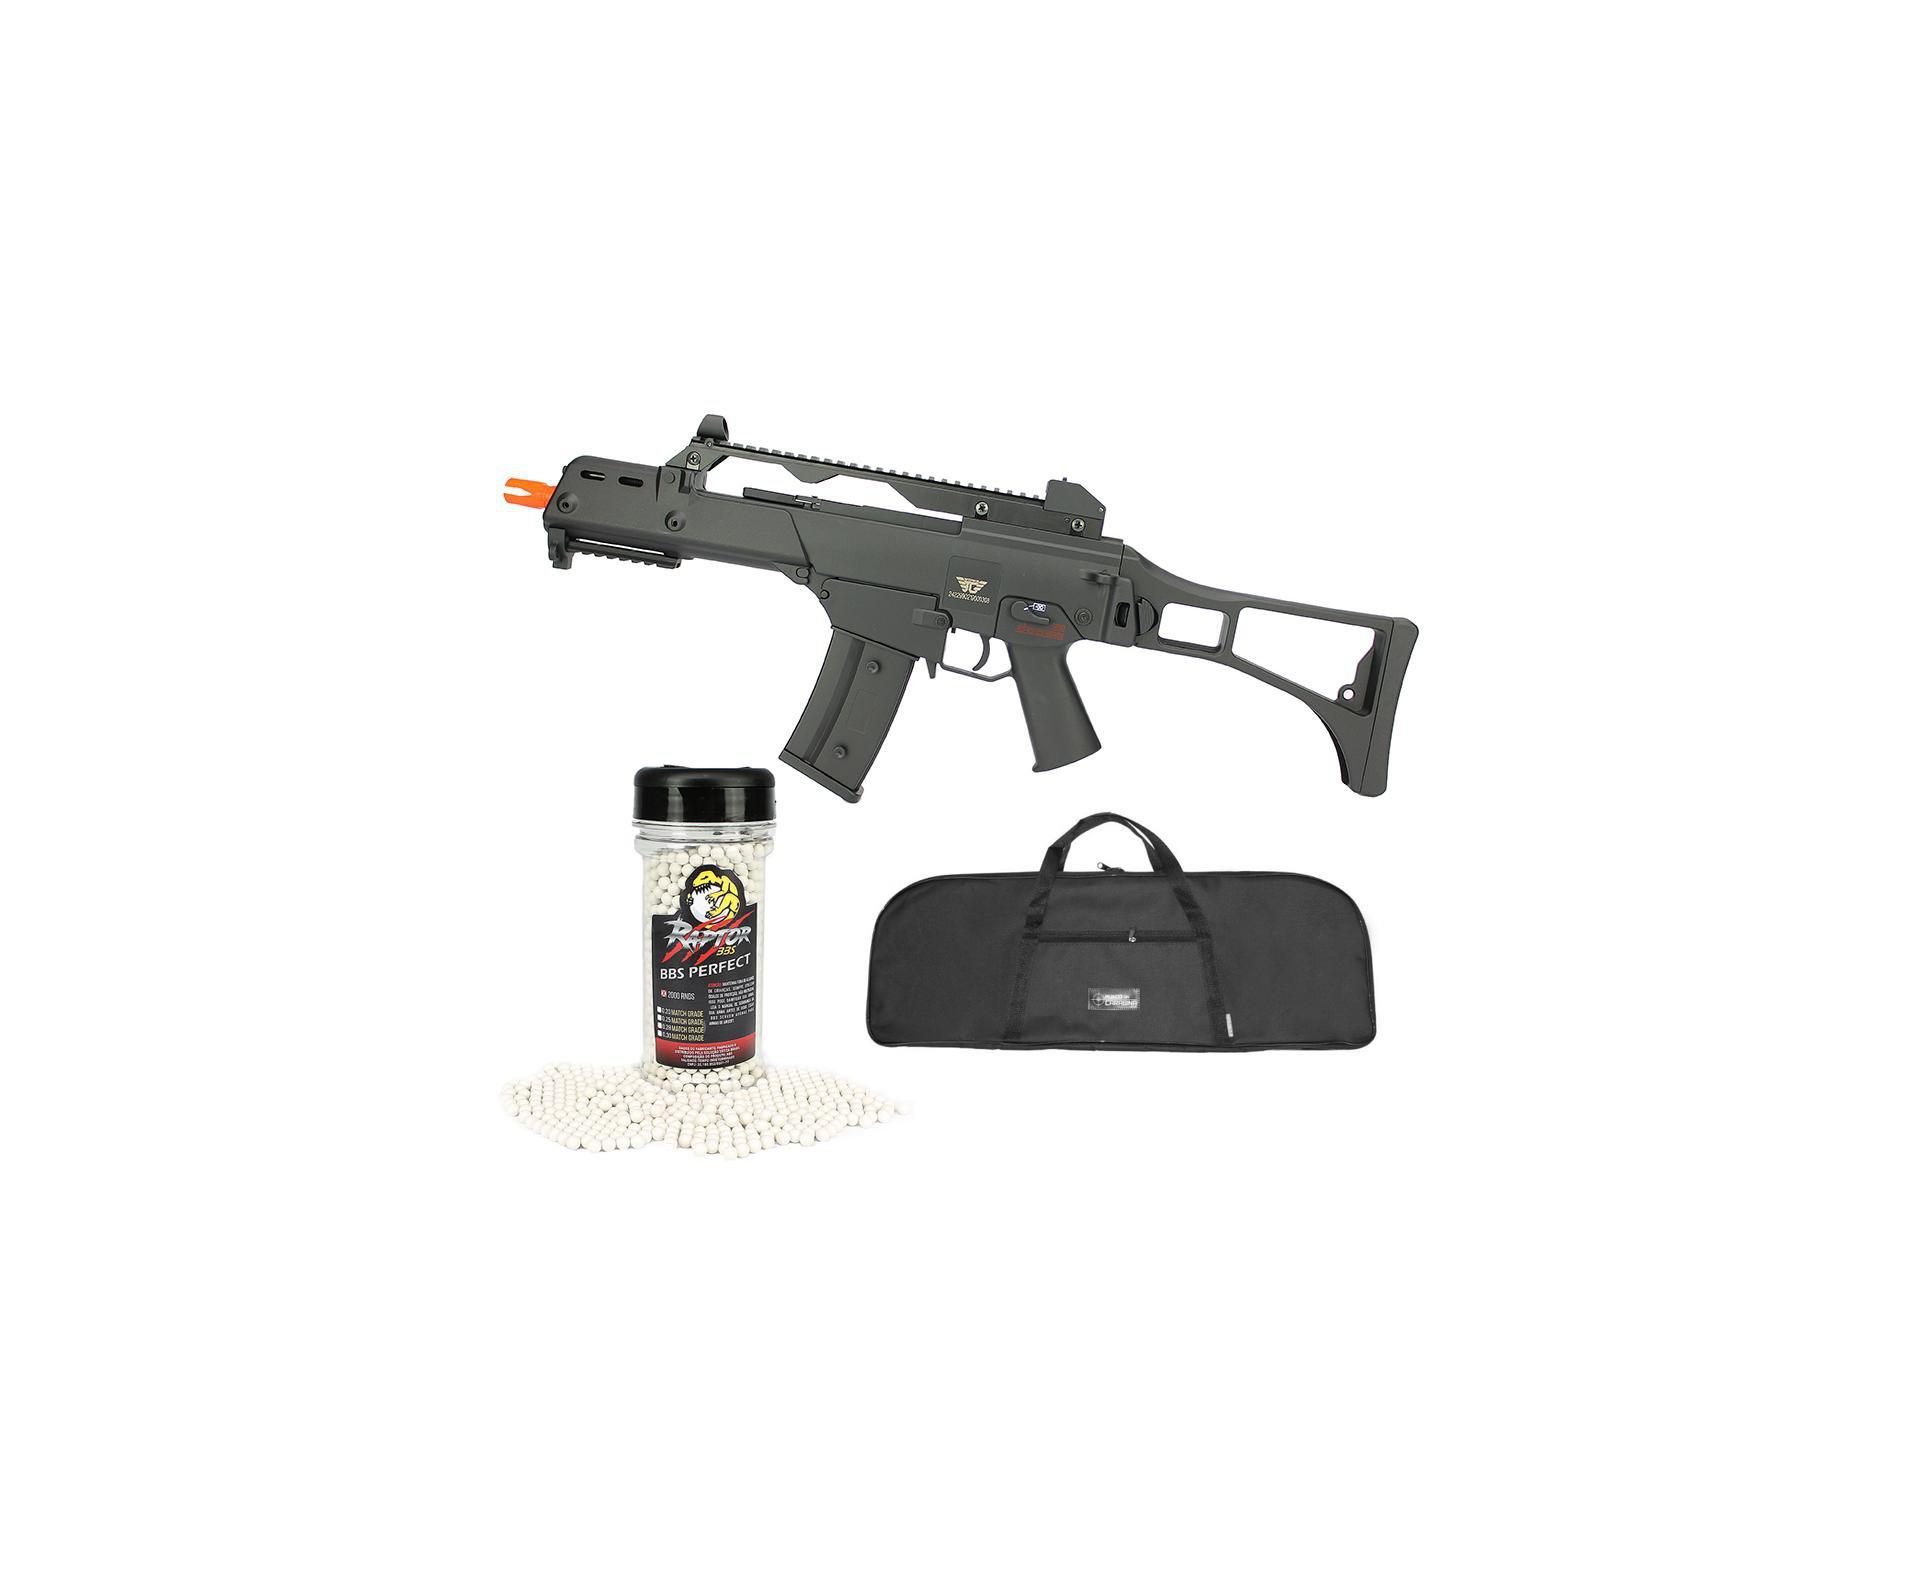 Rifle De Airsoft Aeg G36 Cal 6mm G608-0638 Jing Gong + Capa Simples + Bbs Raptor 0,28g 2000uni